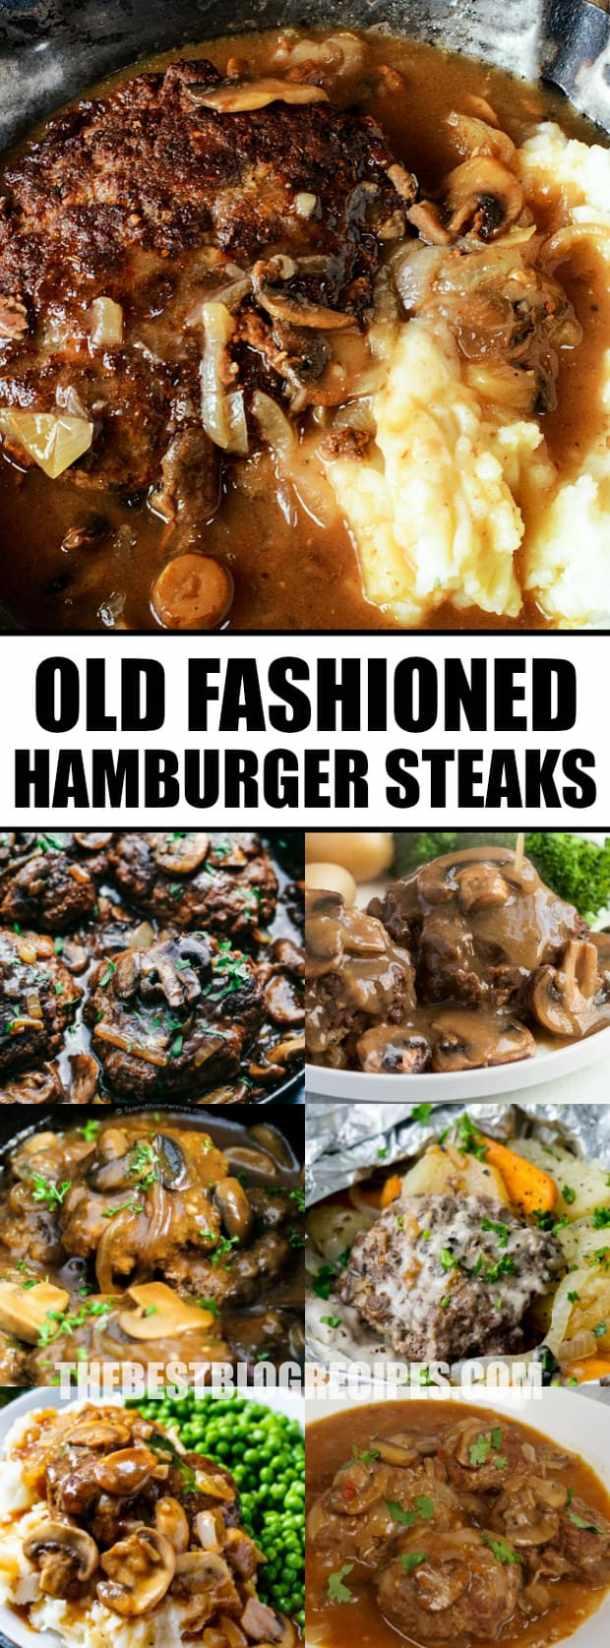 Old Fashioned Hamburger Steaks with Mushroom Onion Gravy